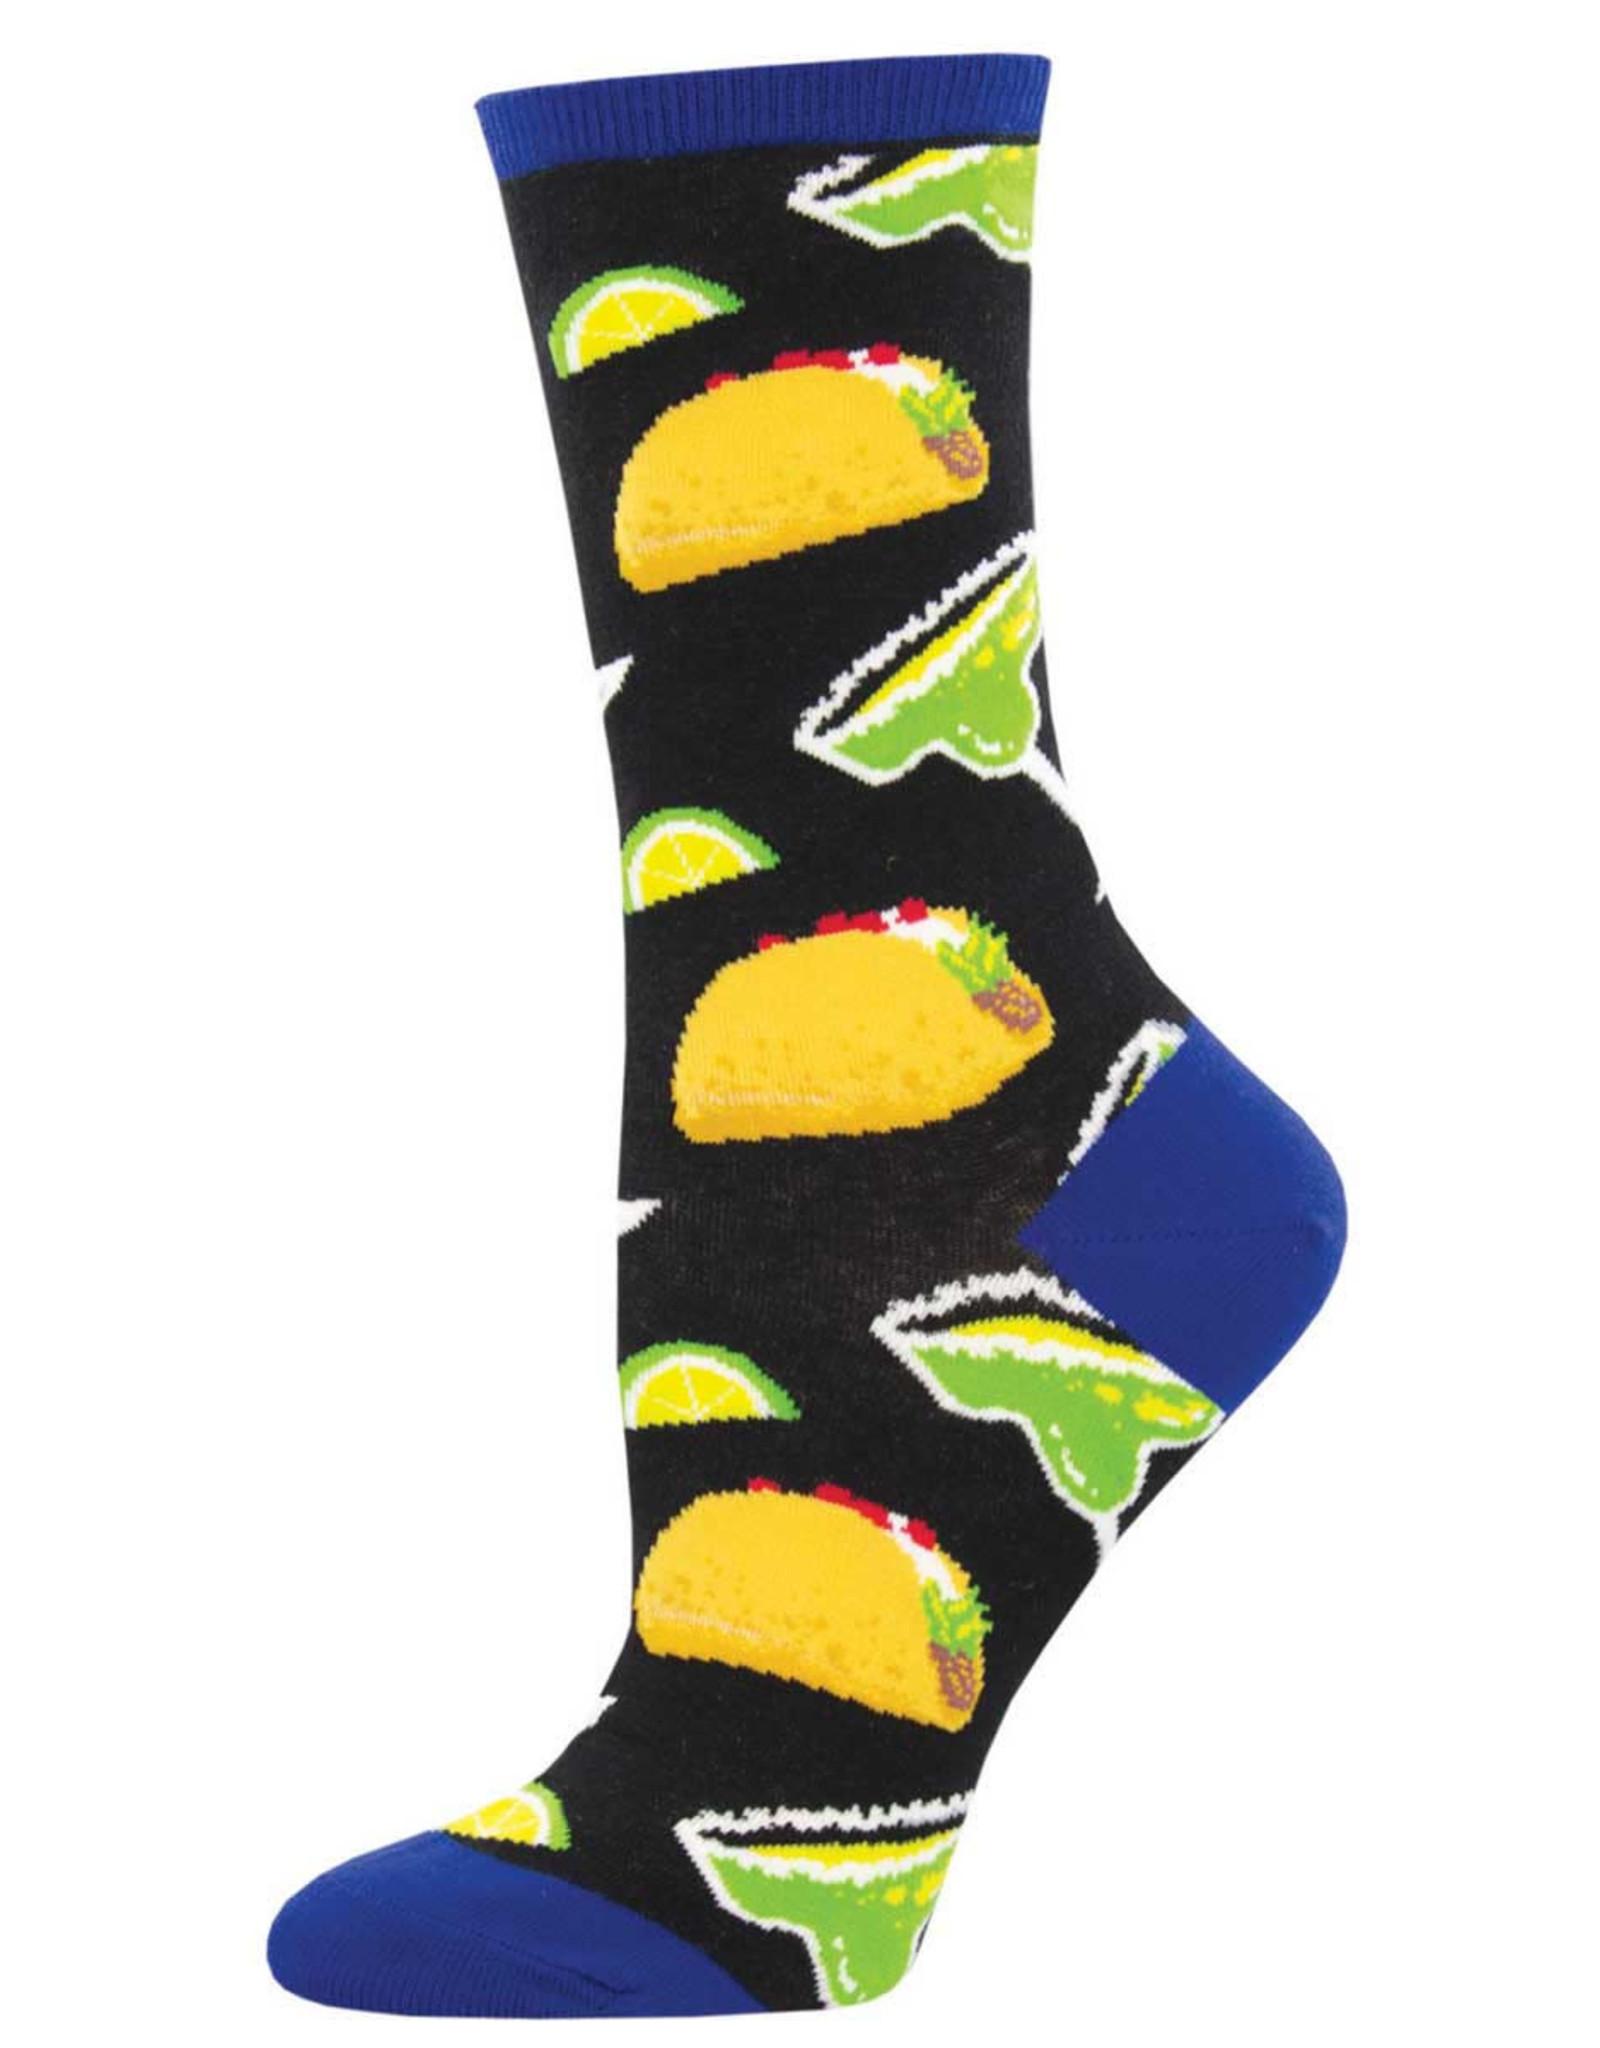 Socksmith Women's Tacos and Margs Socks